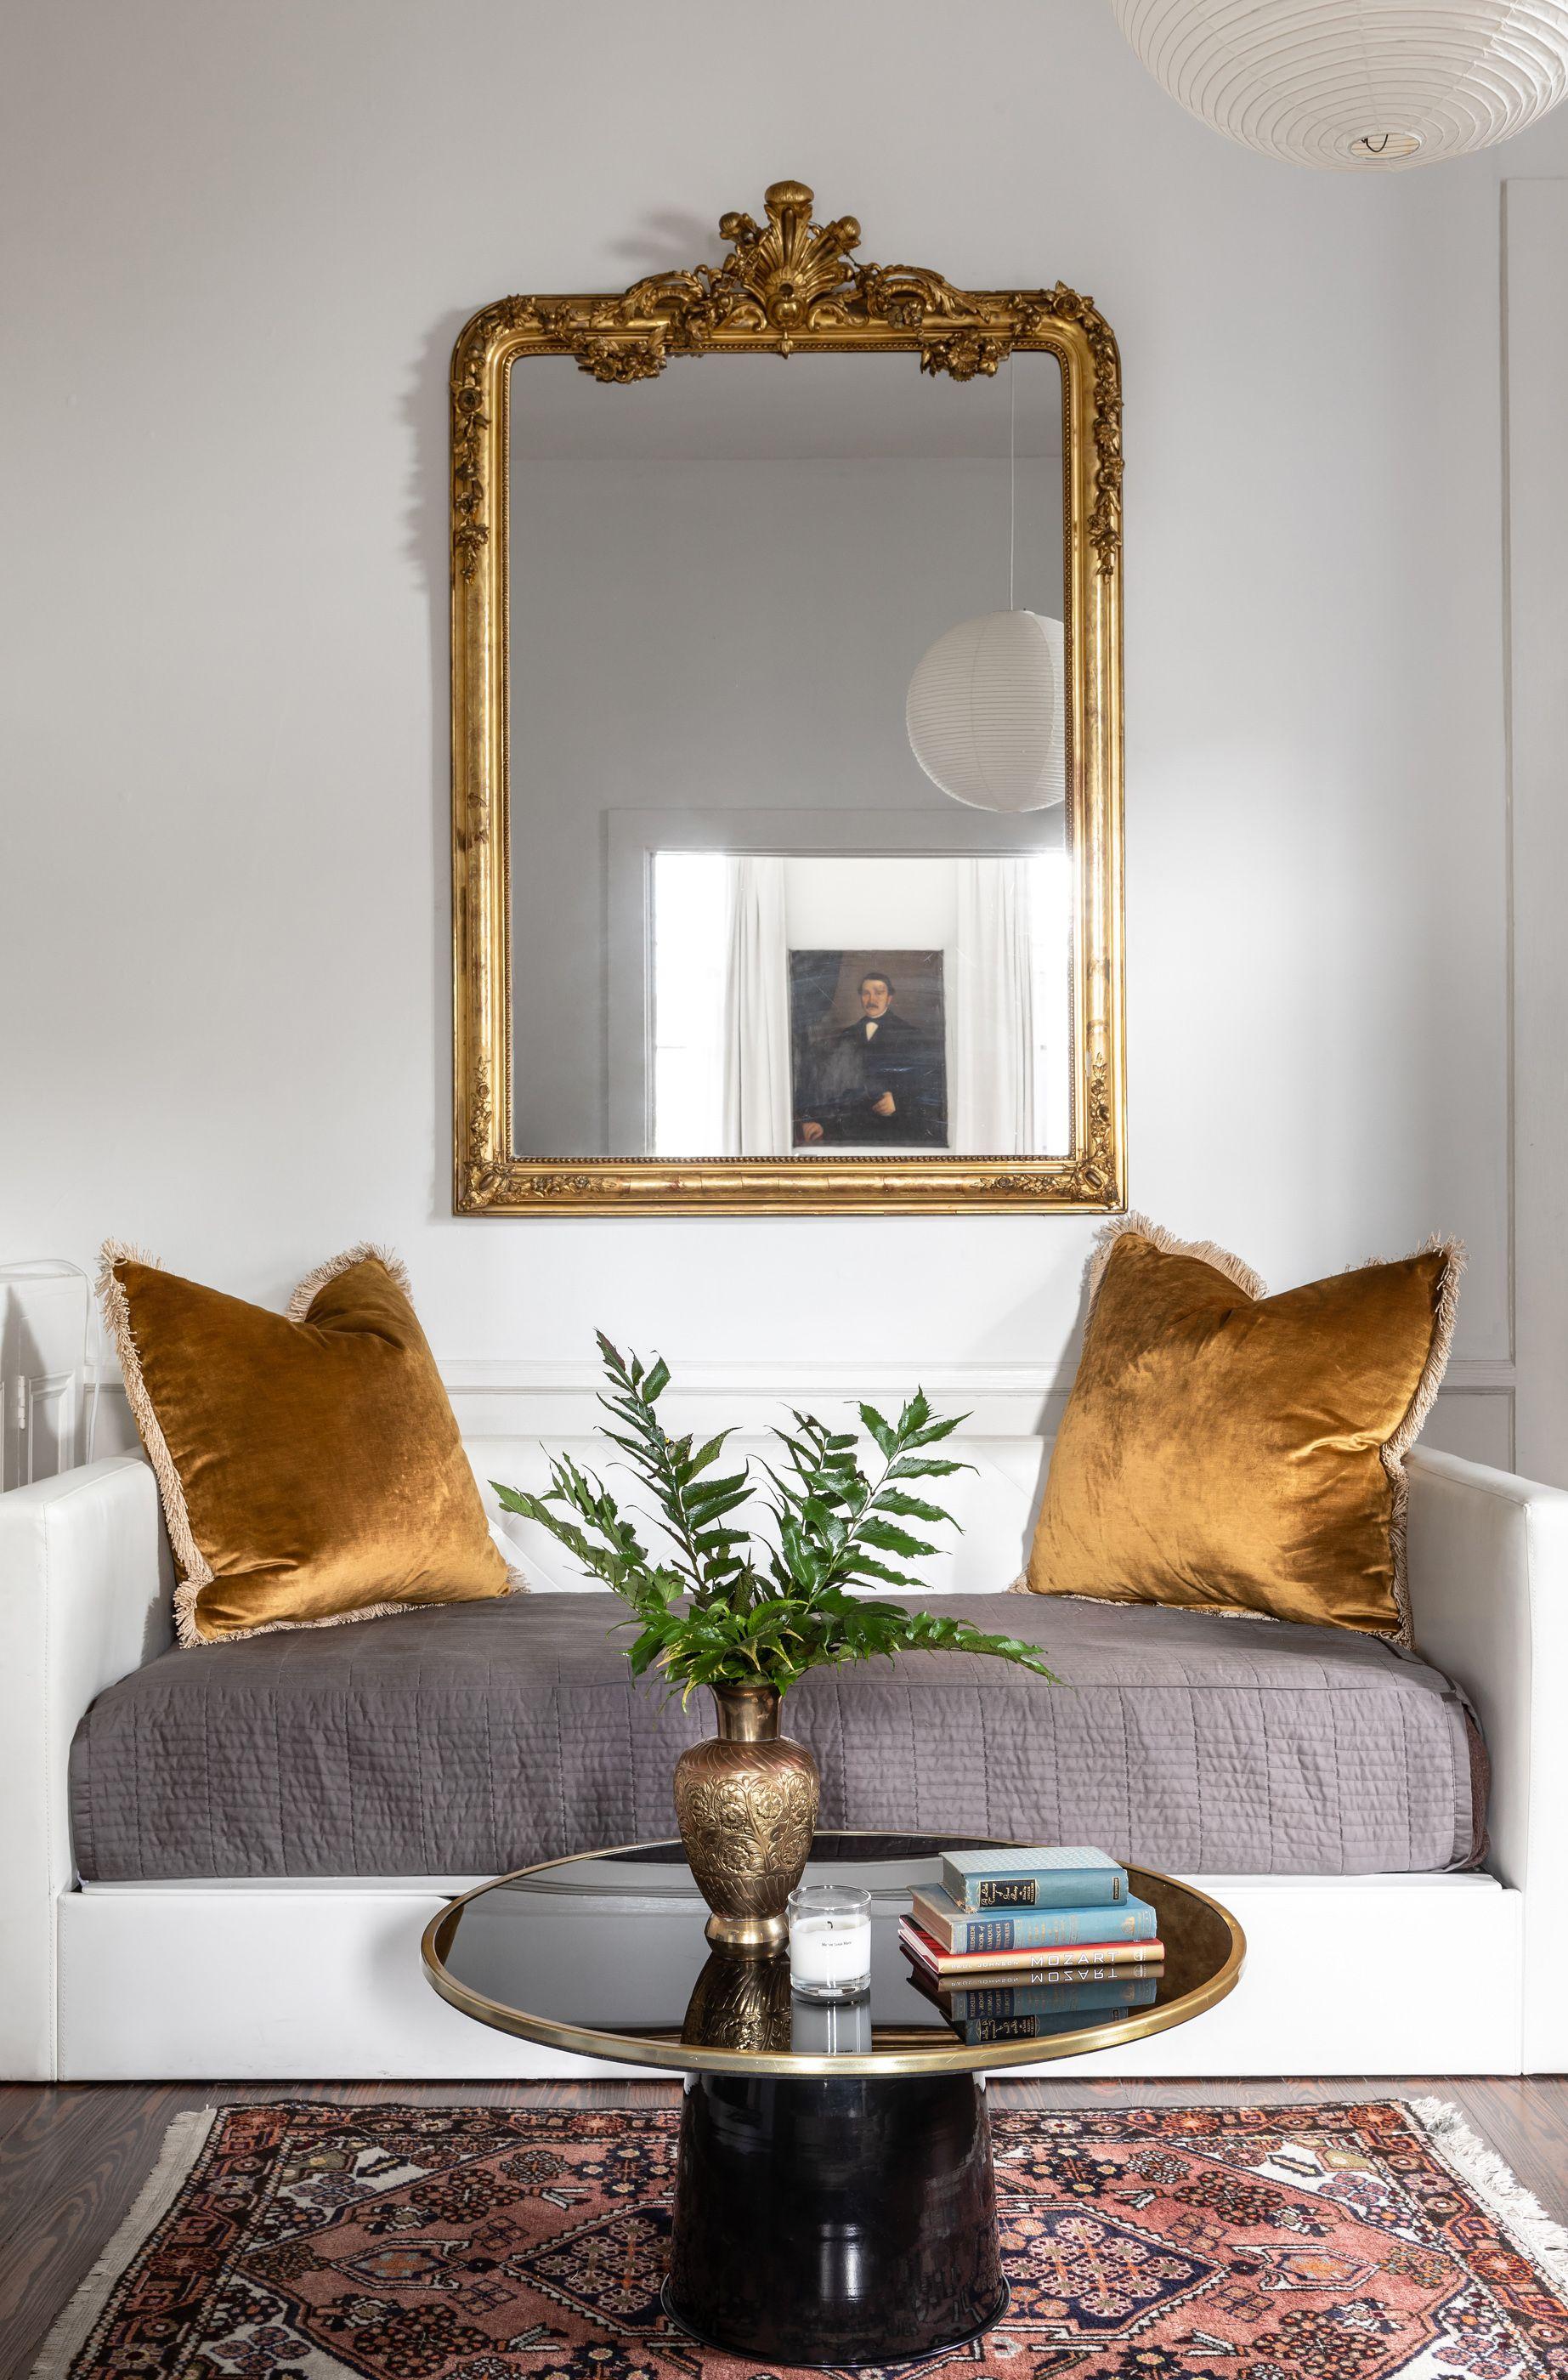 Designer Spotlight Meet Sherry Shirah Of Sls Designs Lauren Williams Art Home Home Decor Interior Home #spotlight #in #living #room